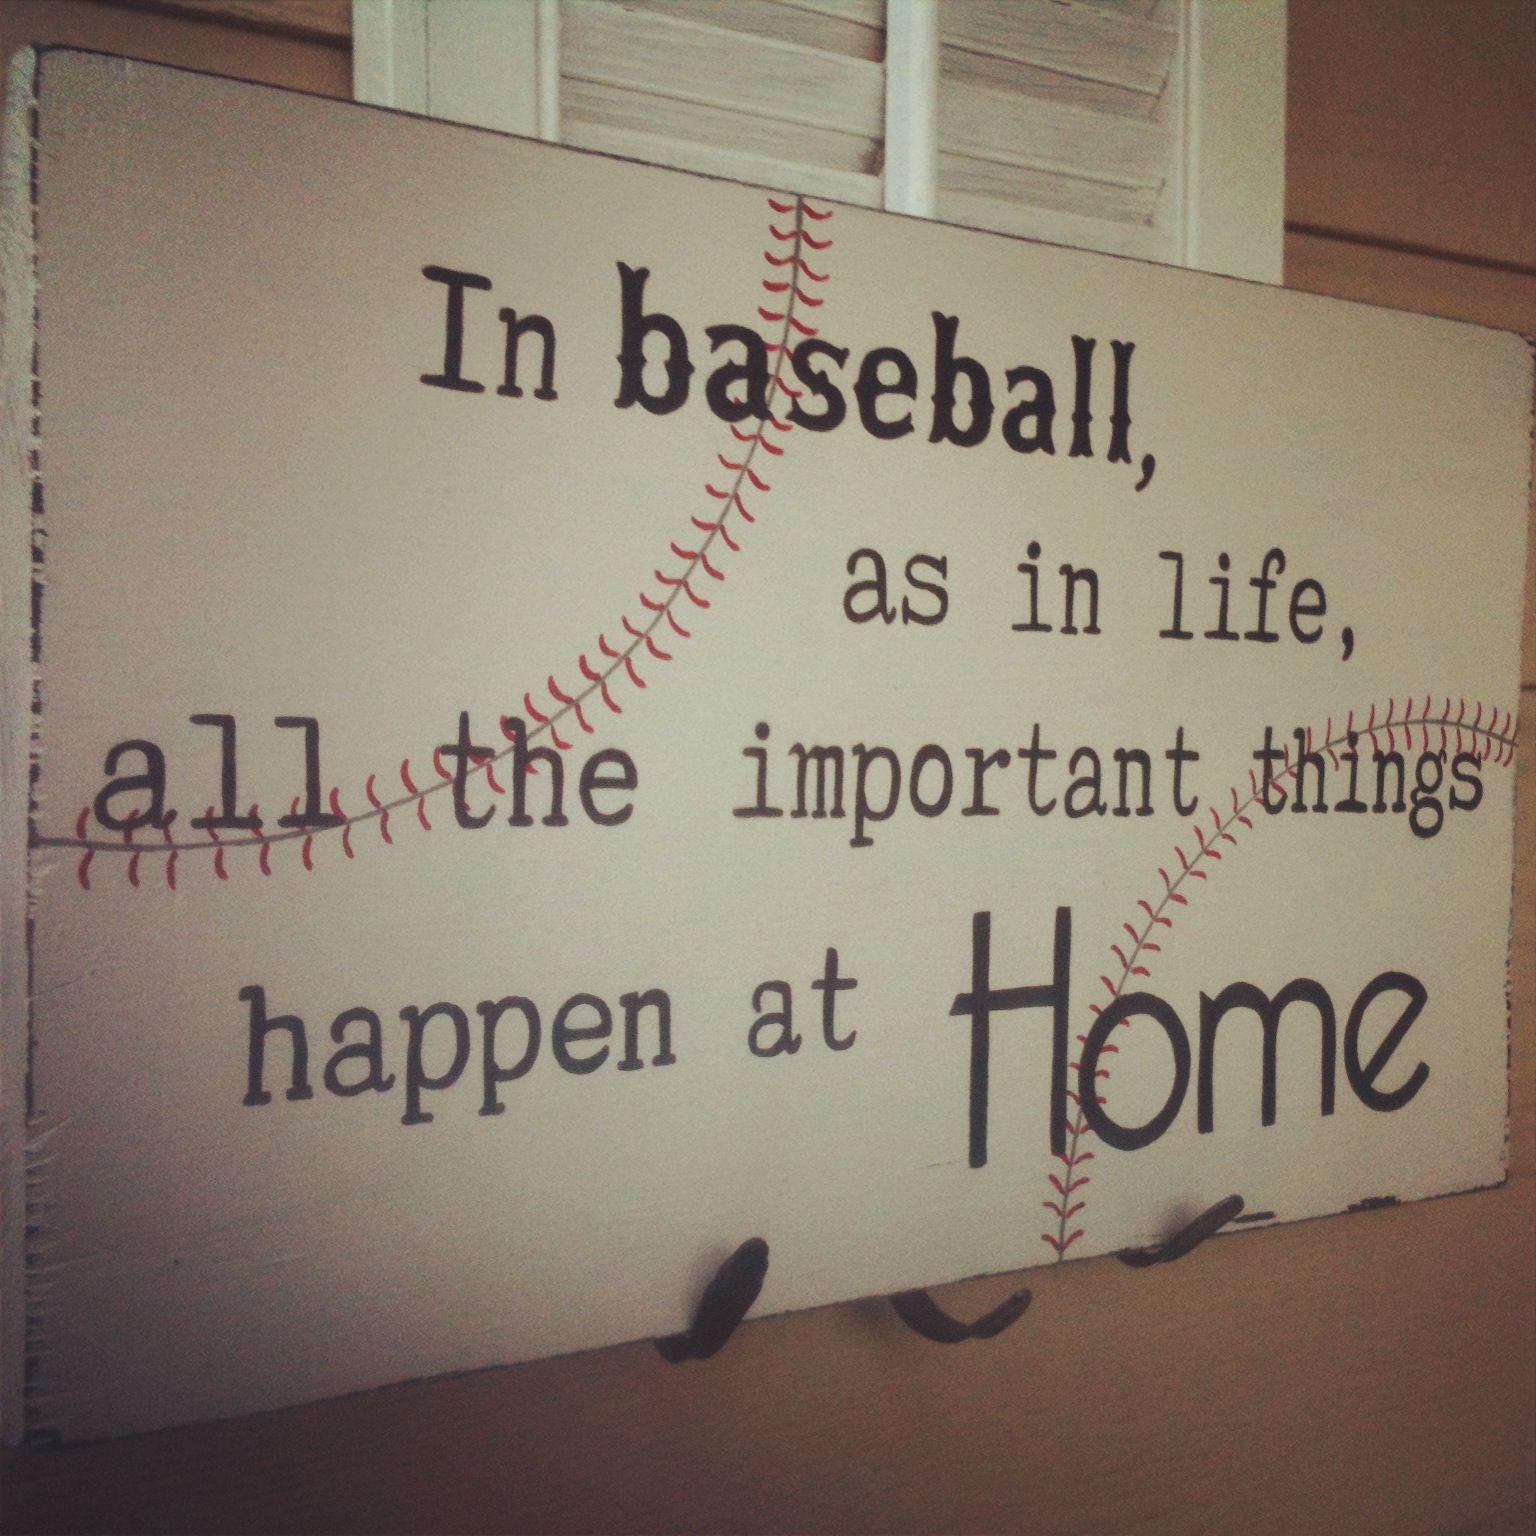 for my future family i wanna make a little baseball diamond in